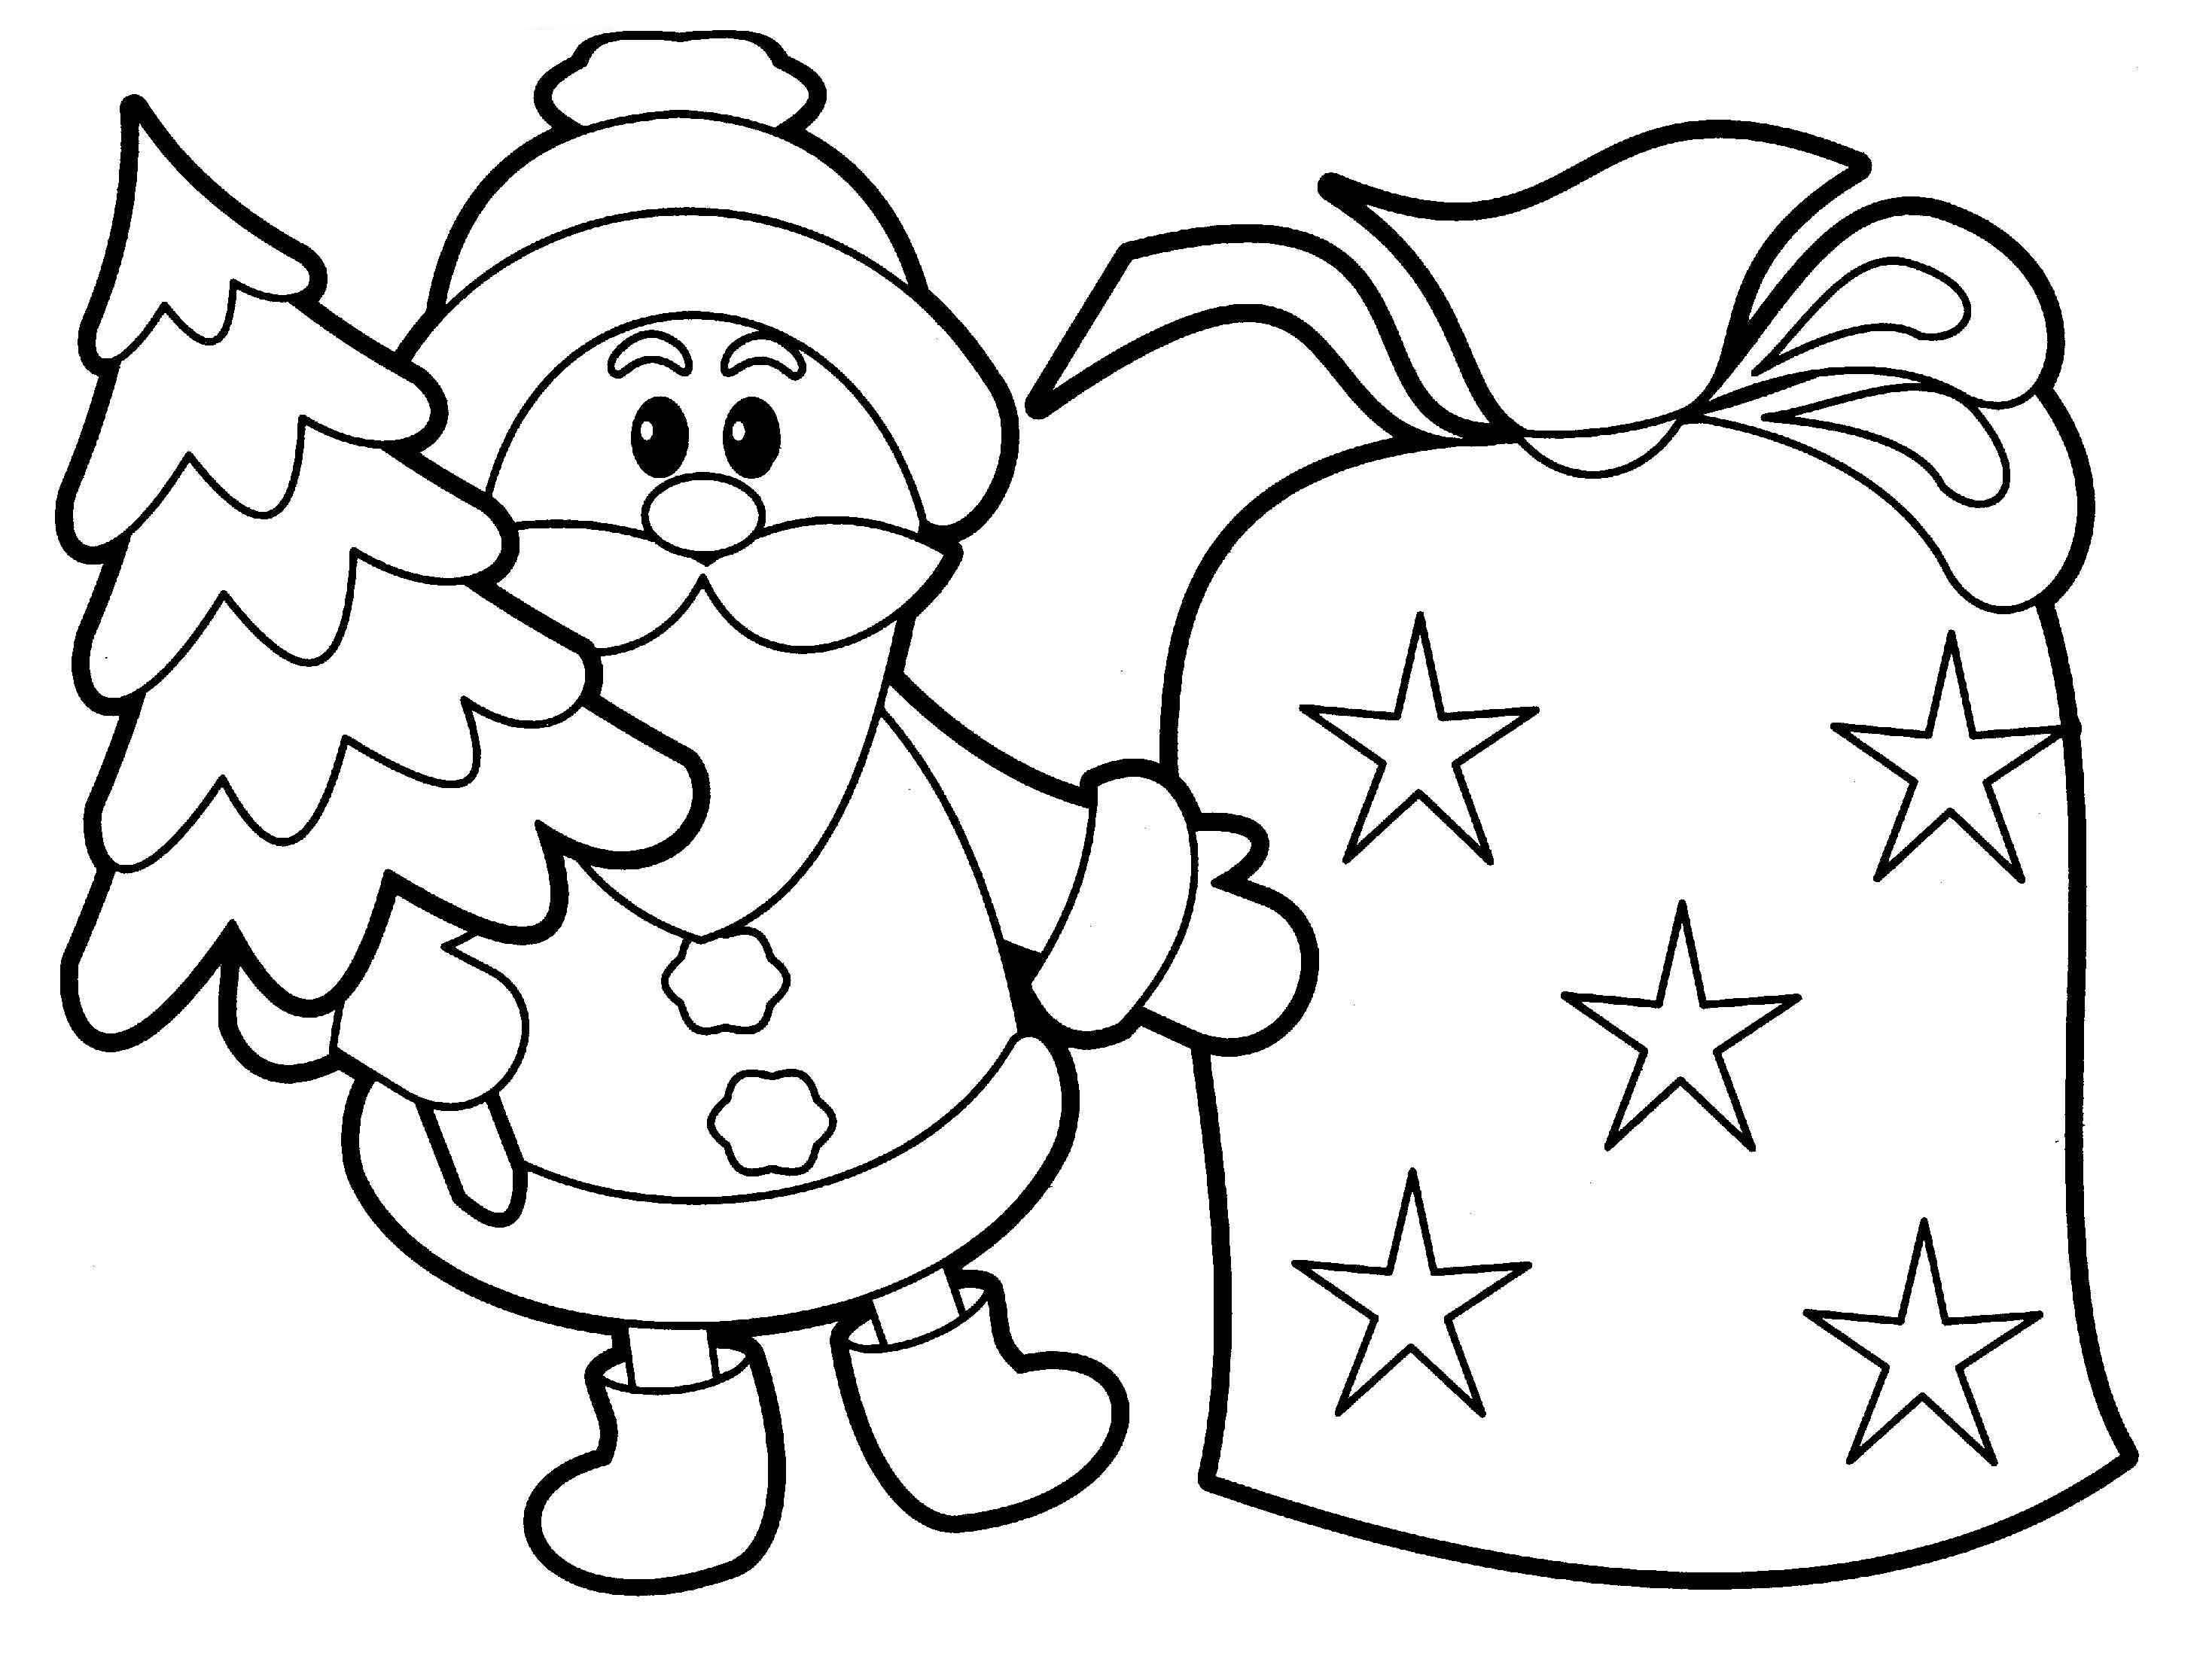 Santa Claus Coloring Pages Image Picture Photo Wallpaper 11